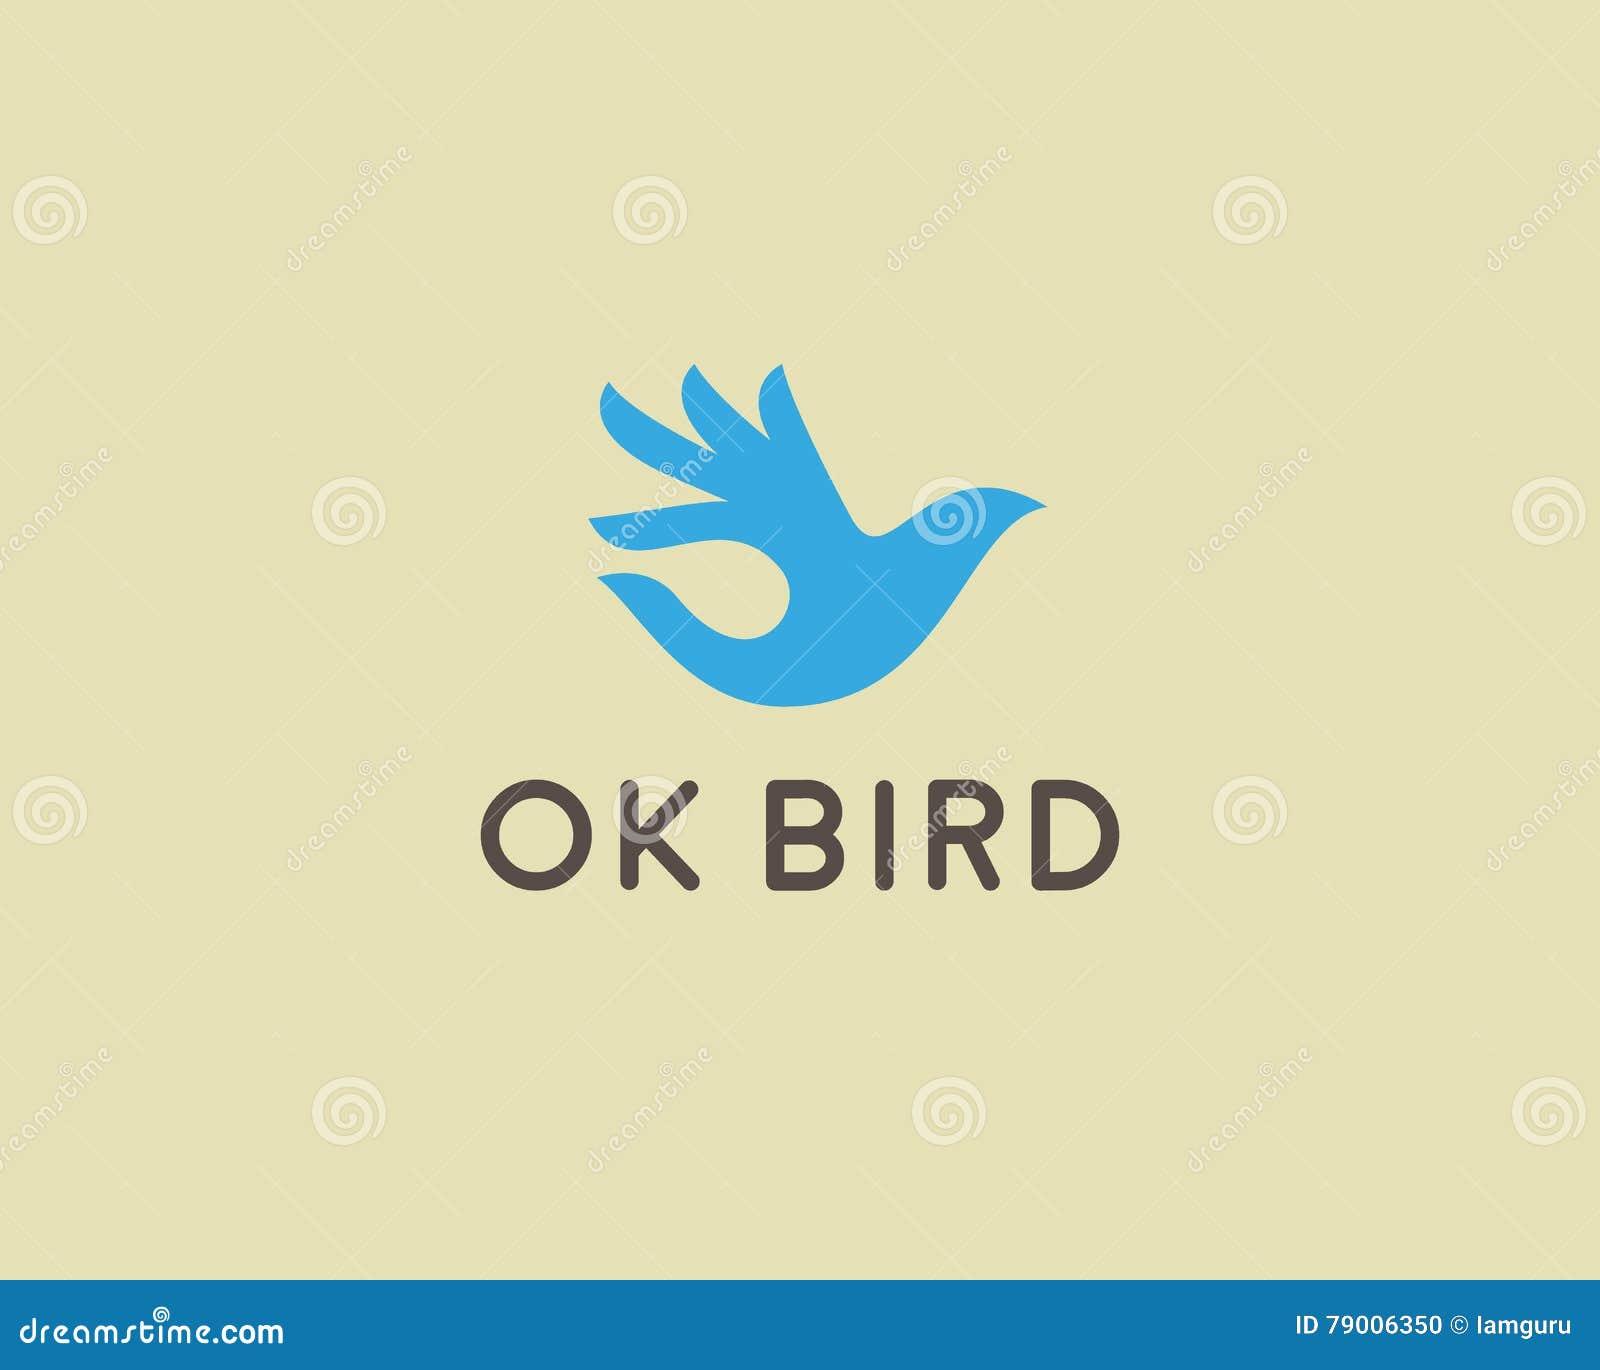 Ok bird vector logo design. Hand wings logotype. Fingers dove okay trick negative space idea symbol.